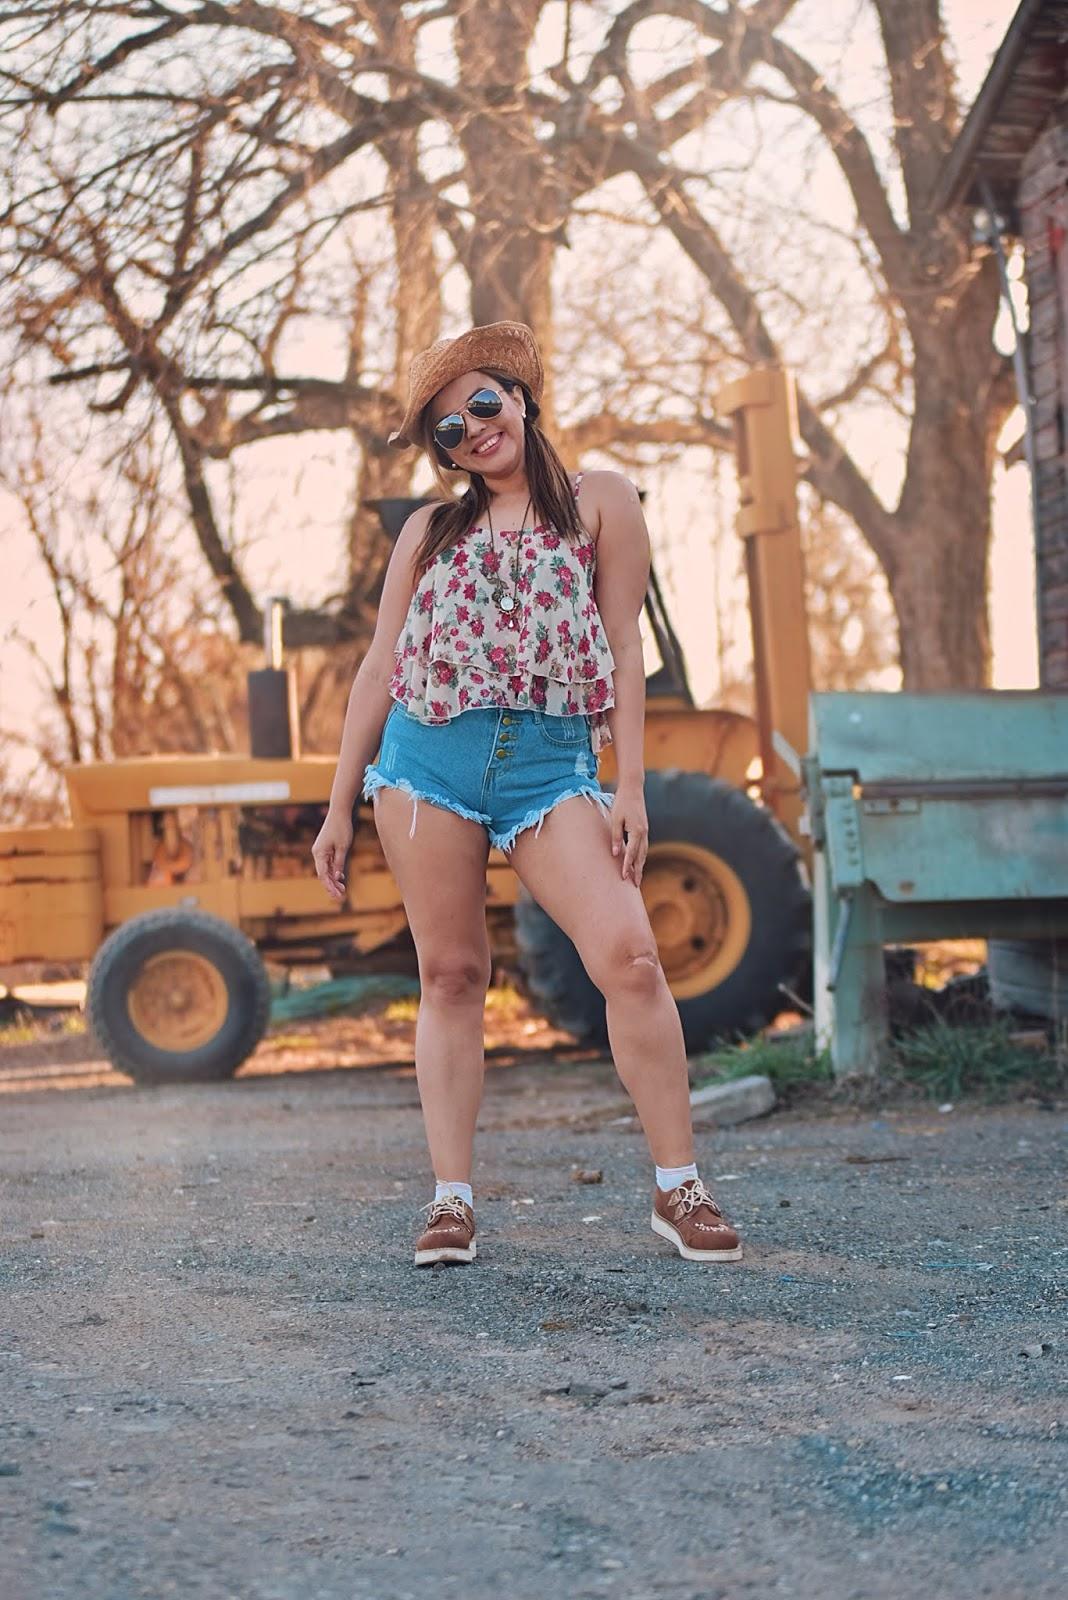 Look De Festival-MariEstilo-SheInFestival-Coachella-Coachella 2019-festival mood-festival vibes-dcblogger-modaelsalvador-marisolflamenco